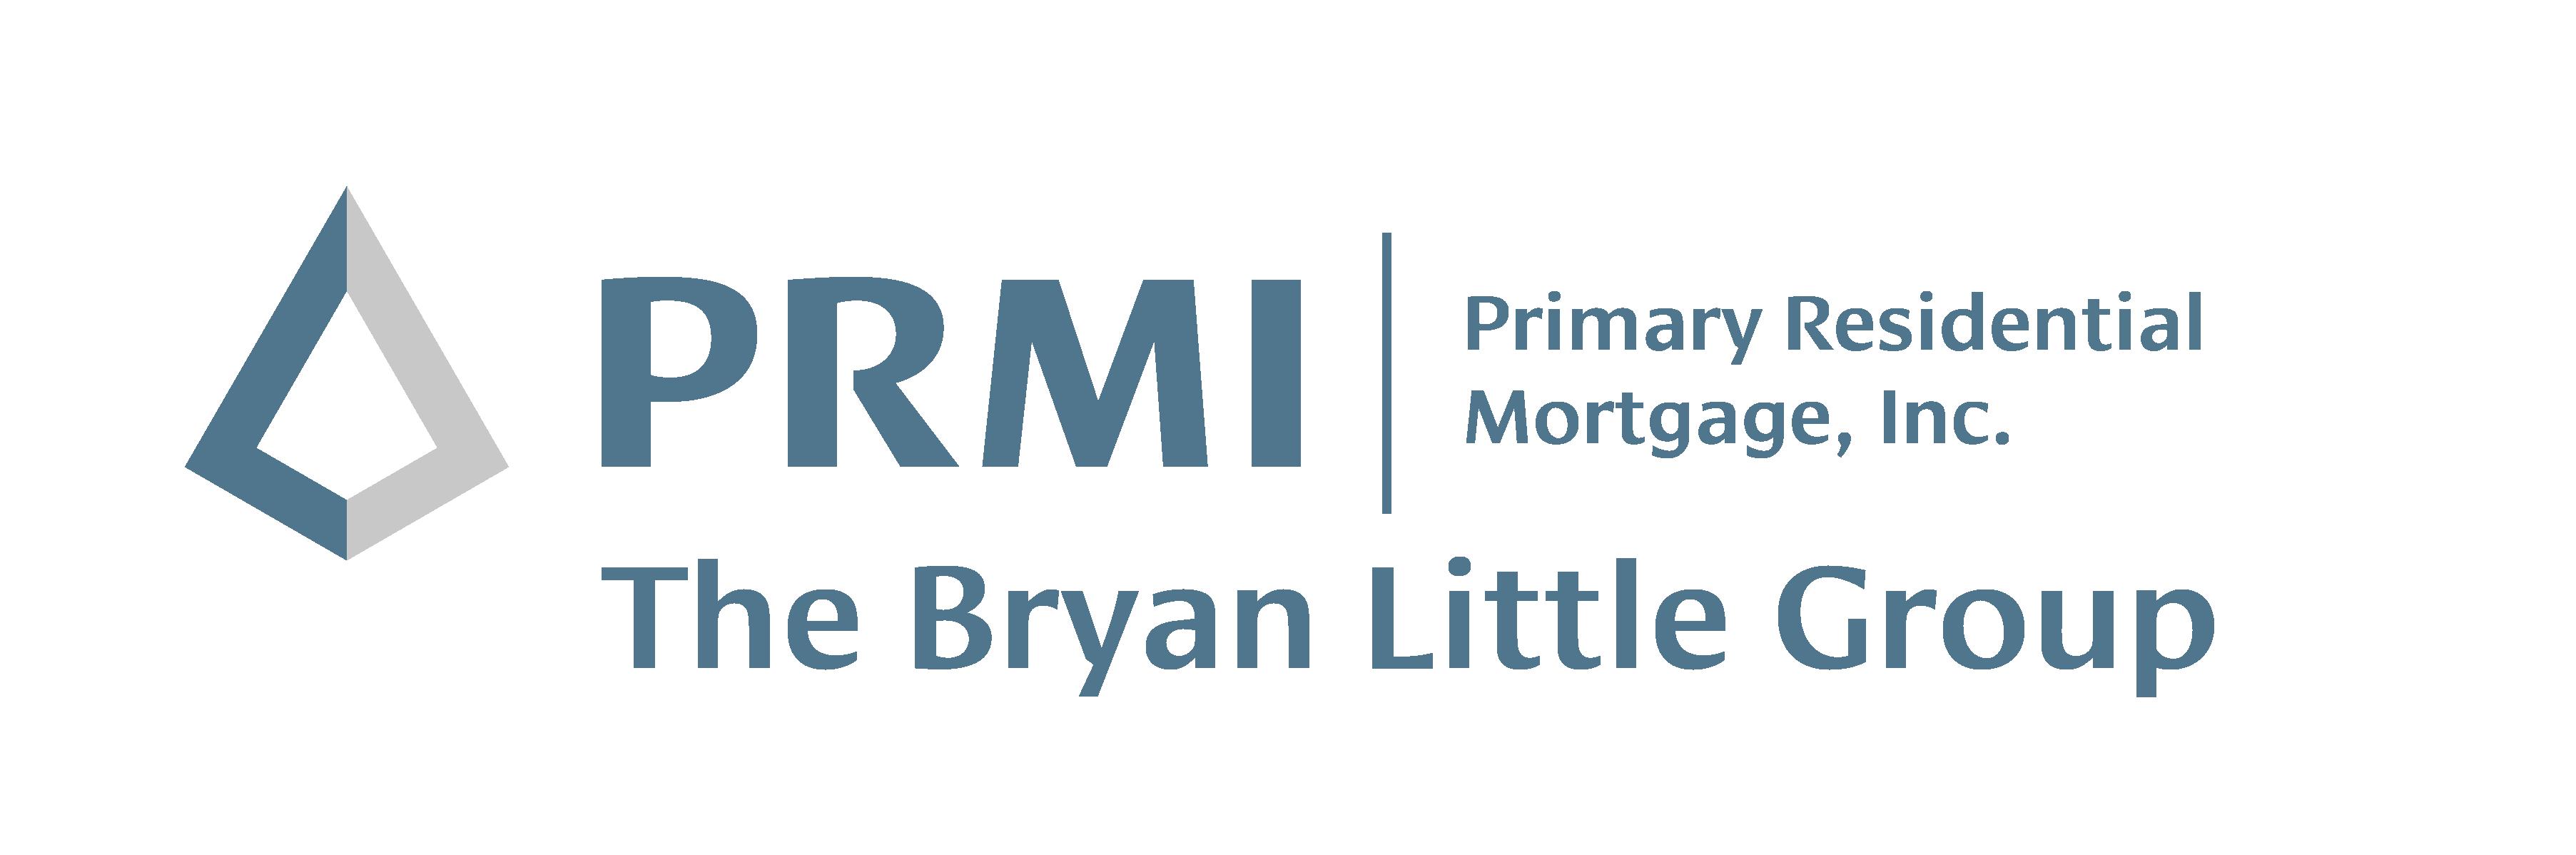 PRMI_Bryan_Little_Group_horizontal_digital